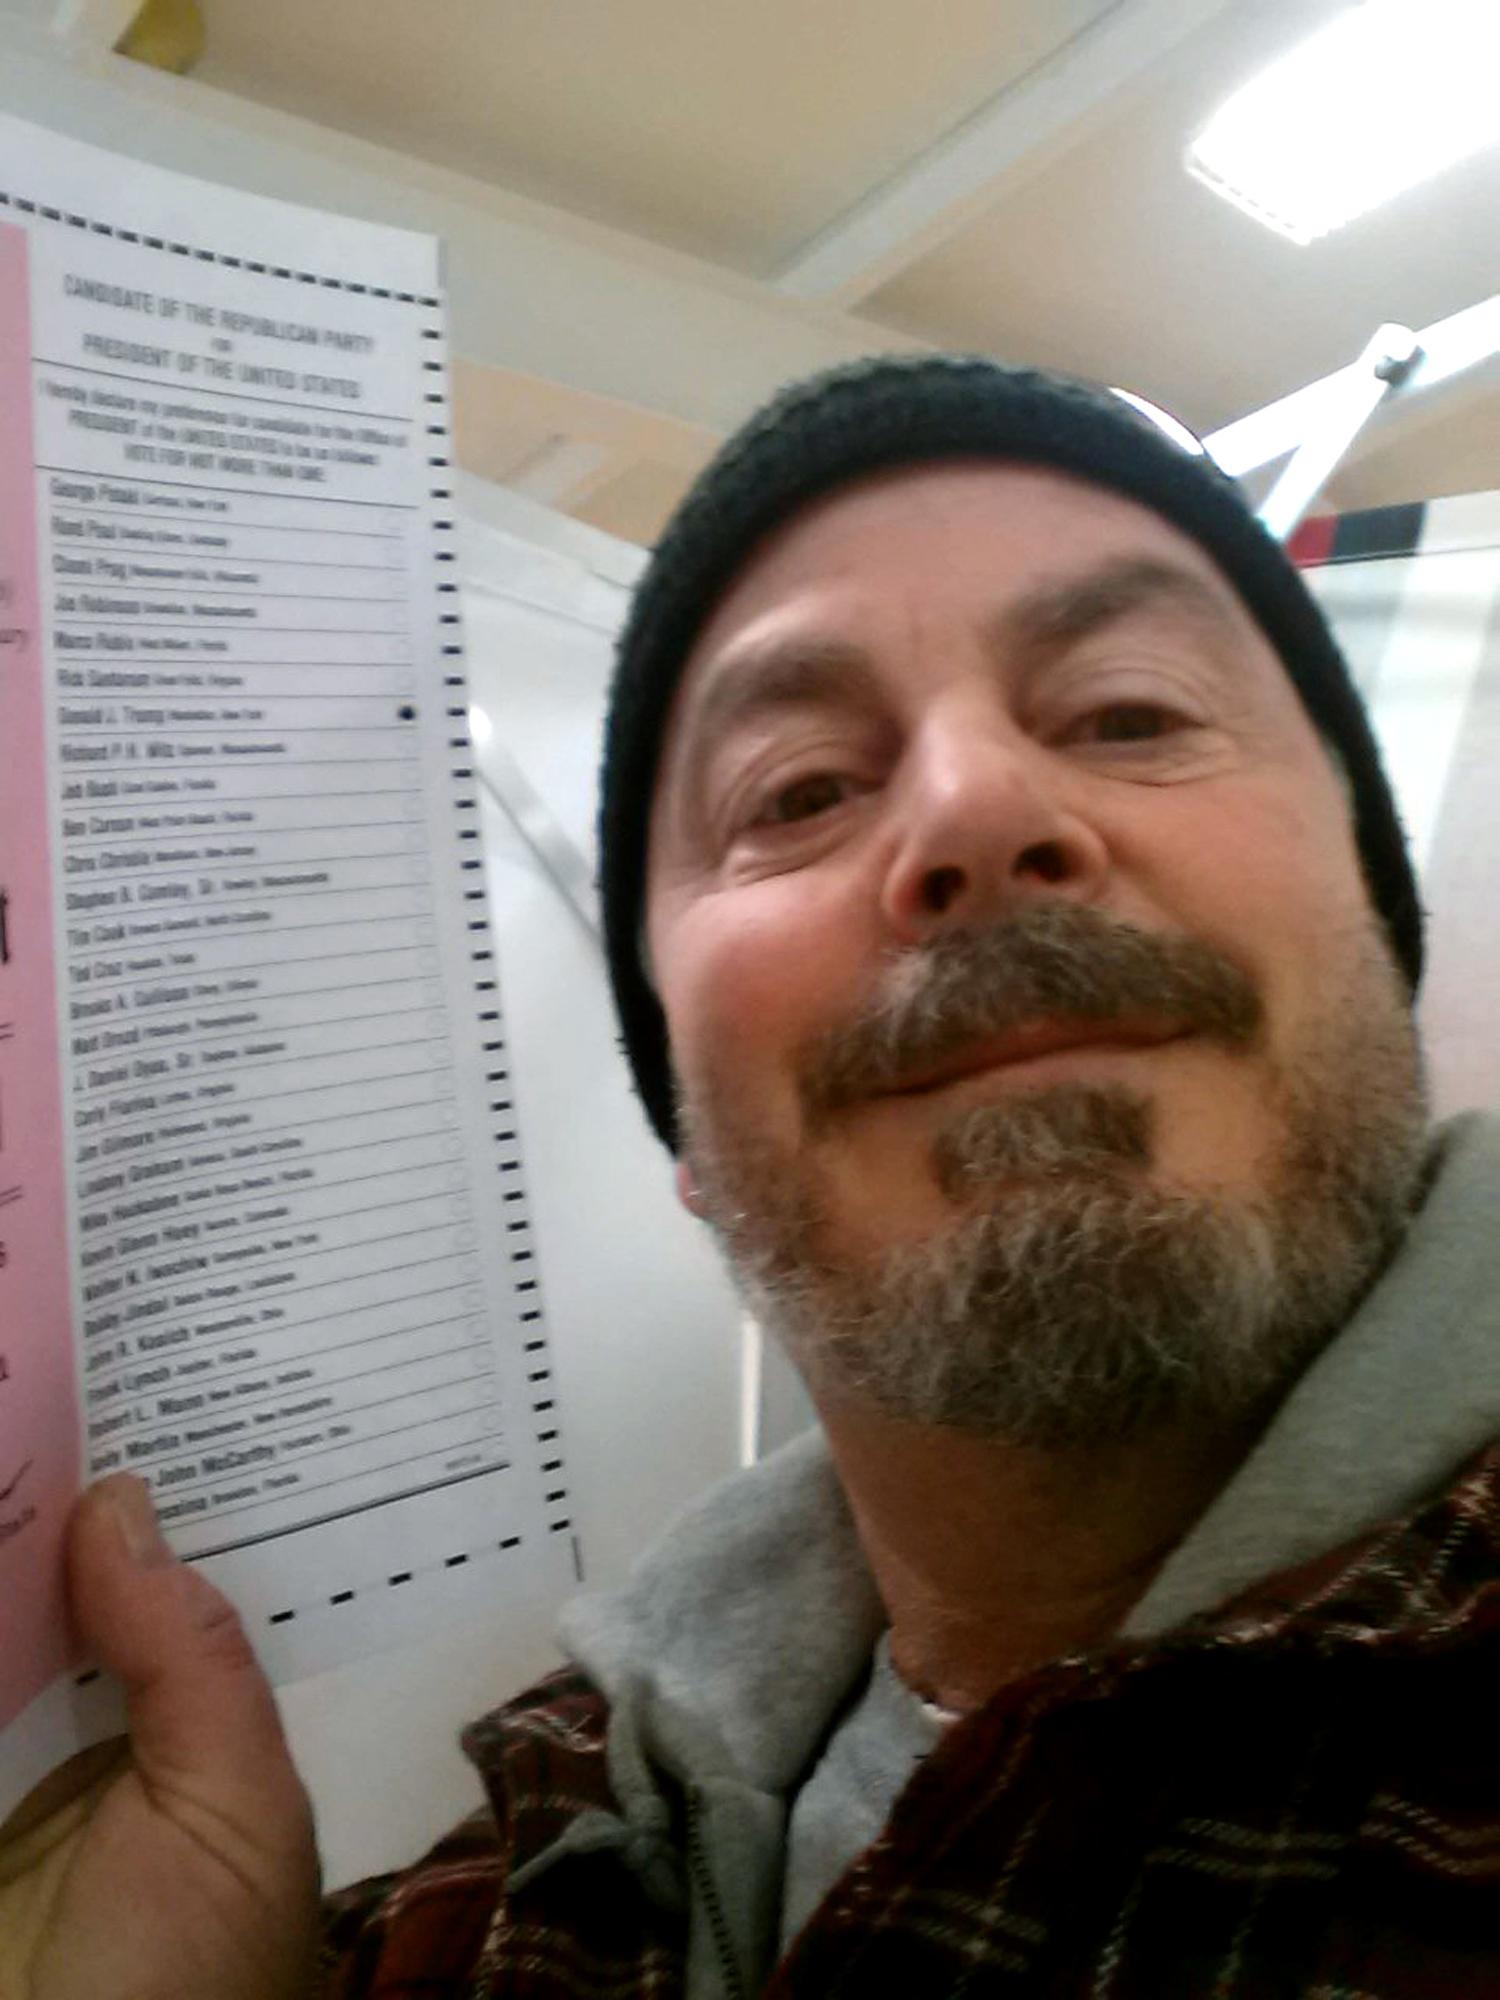 Justin Timberlake's ballot selfie highlights mixed laws